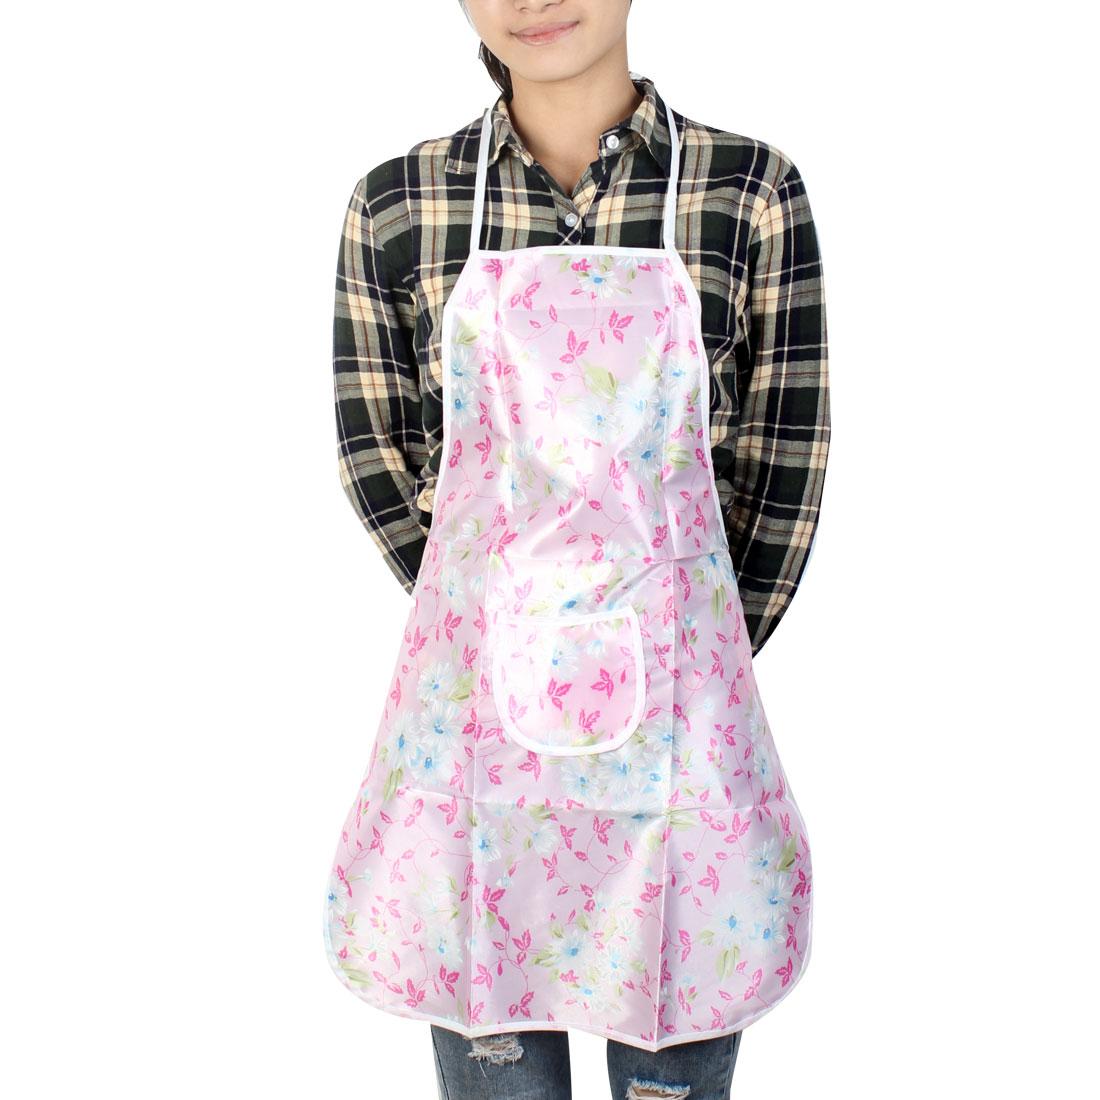 Flower Print Pink Front Patch Pocket Kitchen Bib Apron for Ladies